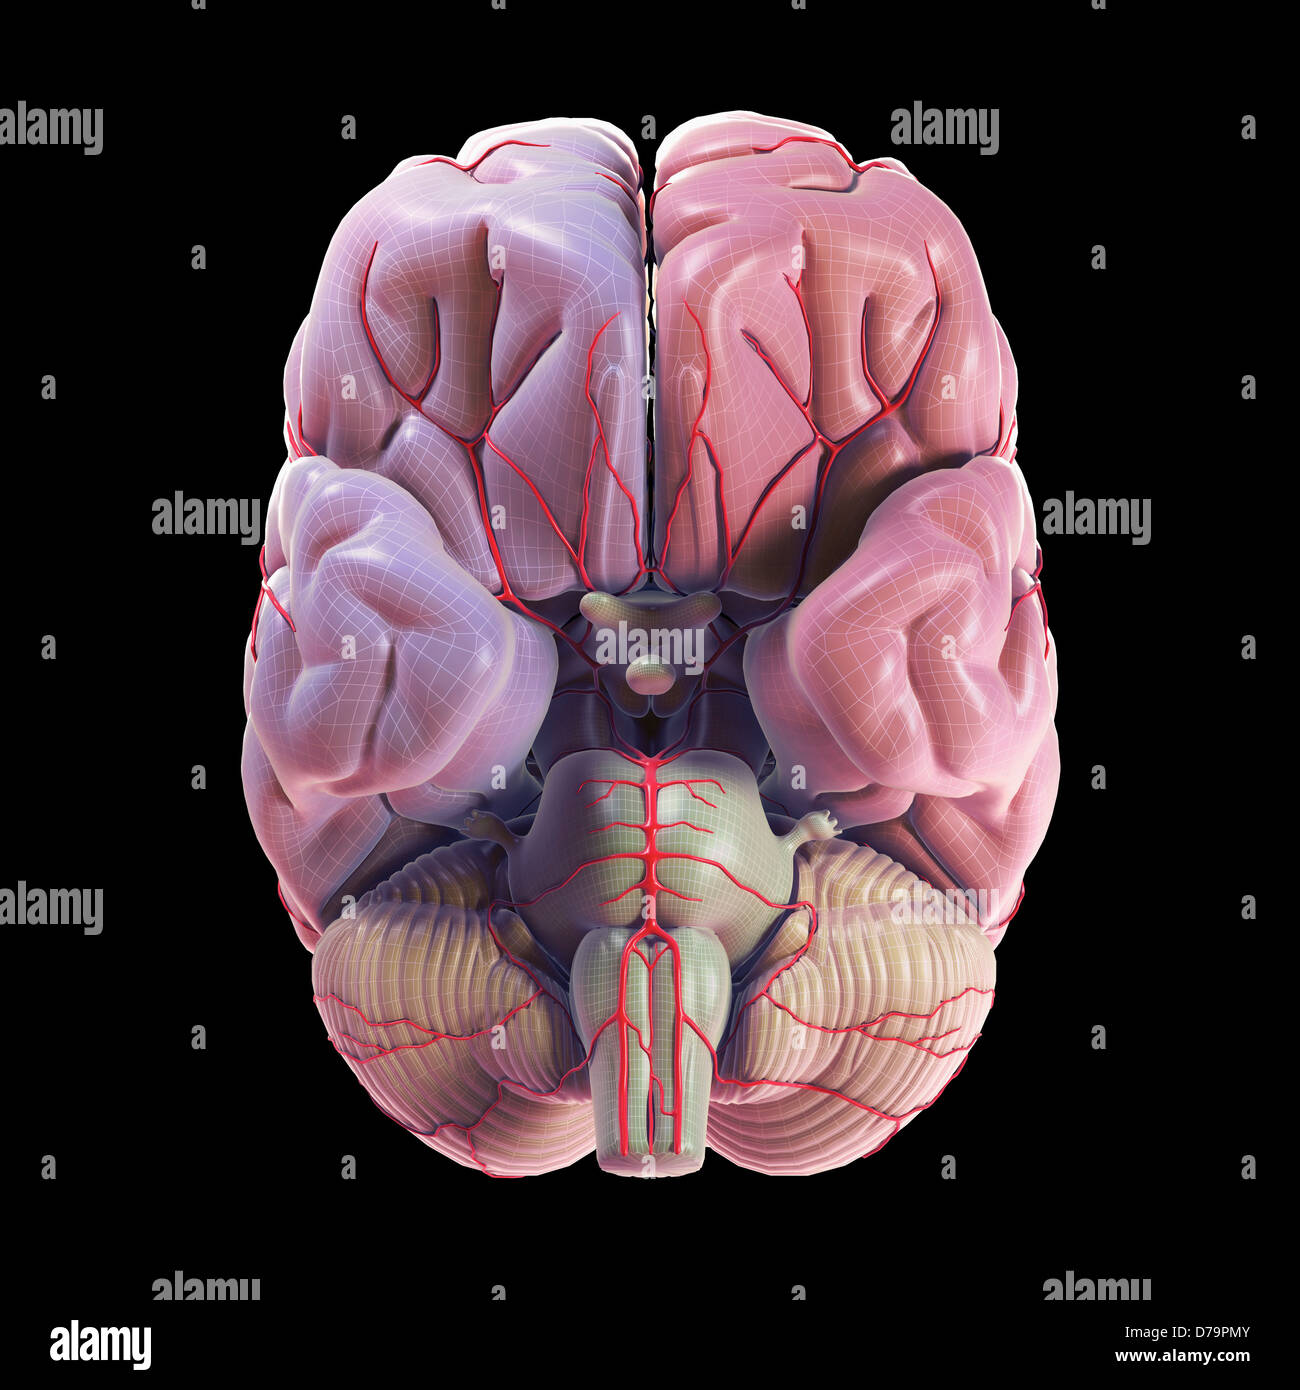 Suministro sanguíneo del cerebro Foto & Imagen De Stock: 56149099 ...